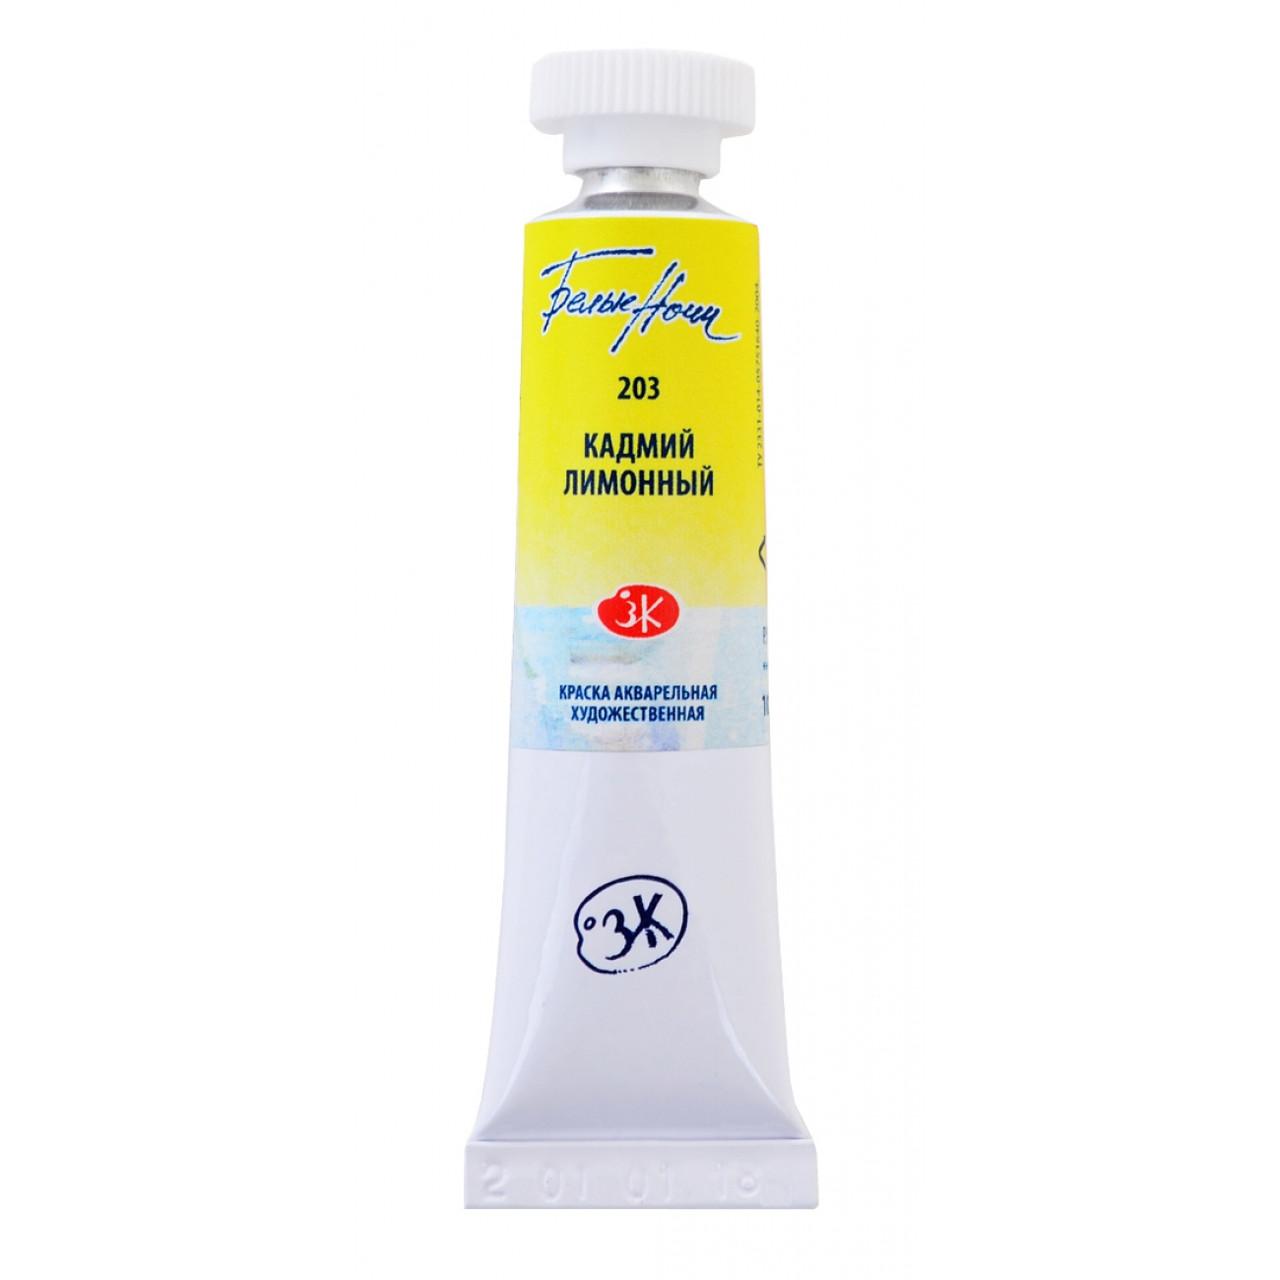 Краска акварельная ТУБА, кадмий лимонный, 10 мл ЗХК